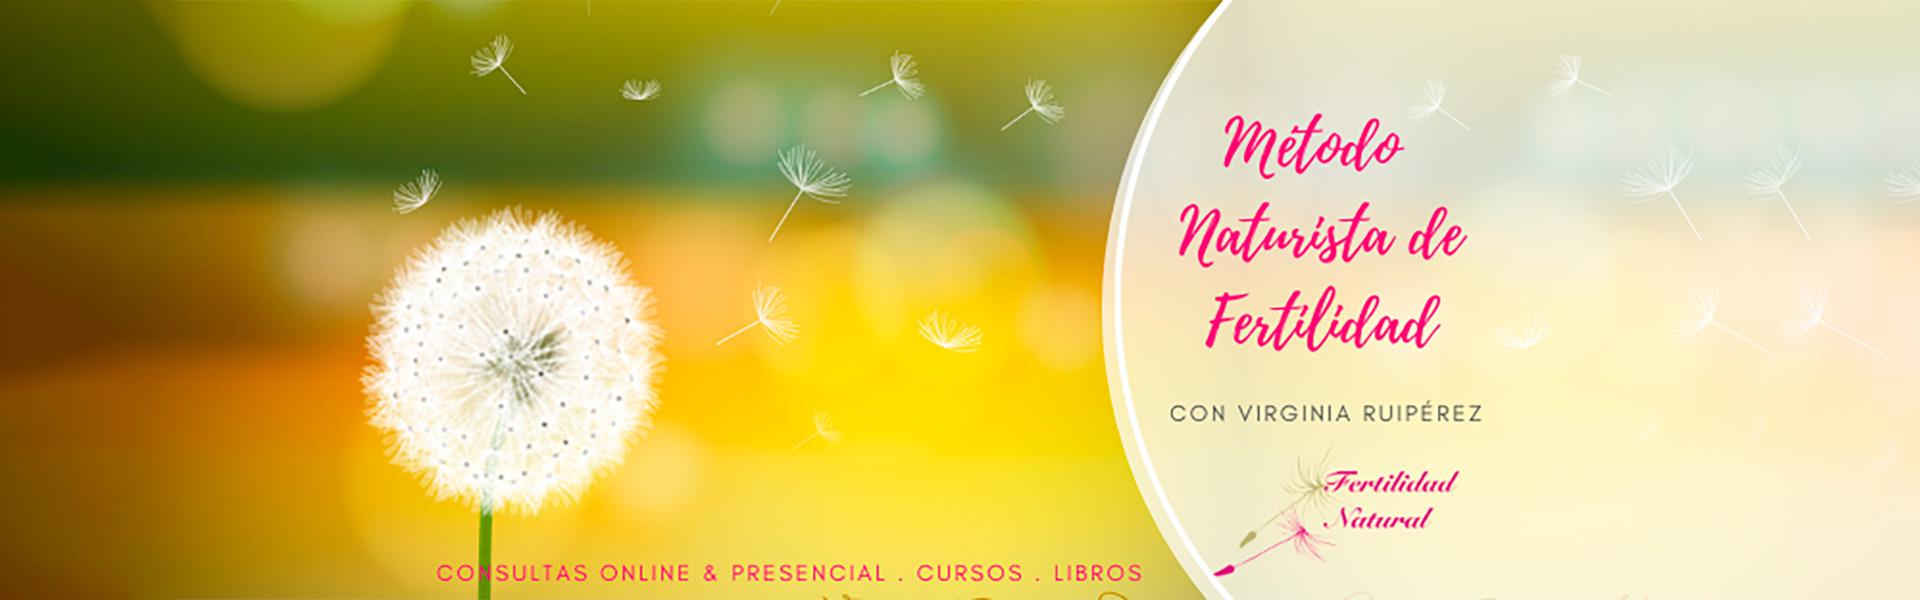 Metodo Fertilidad Natural